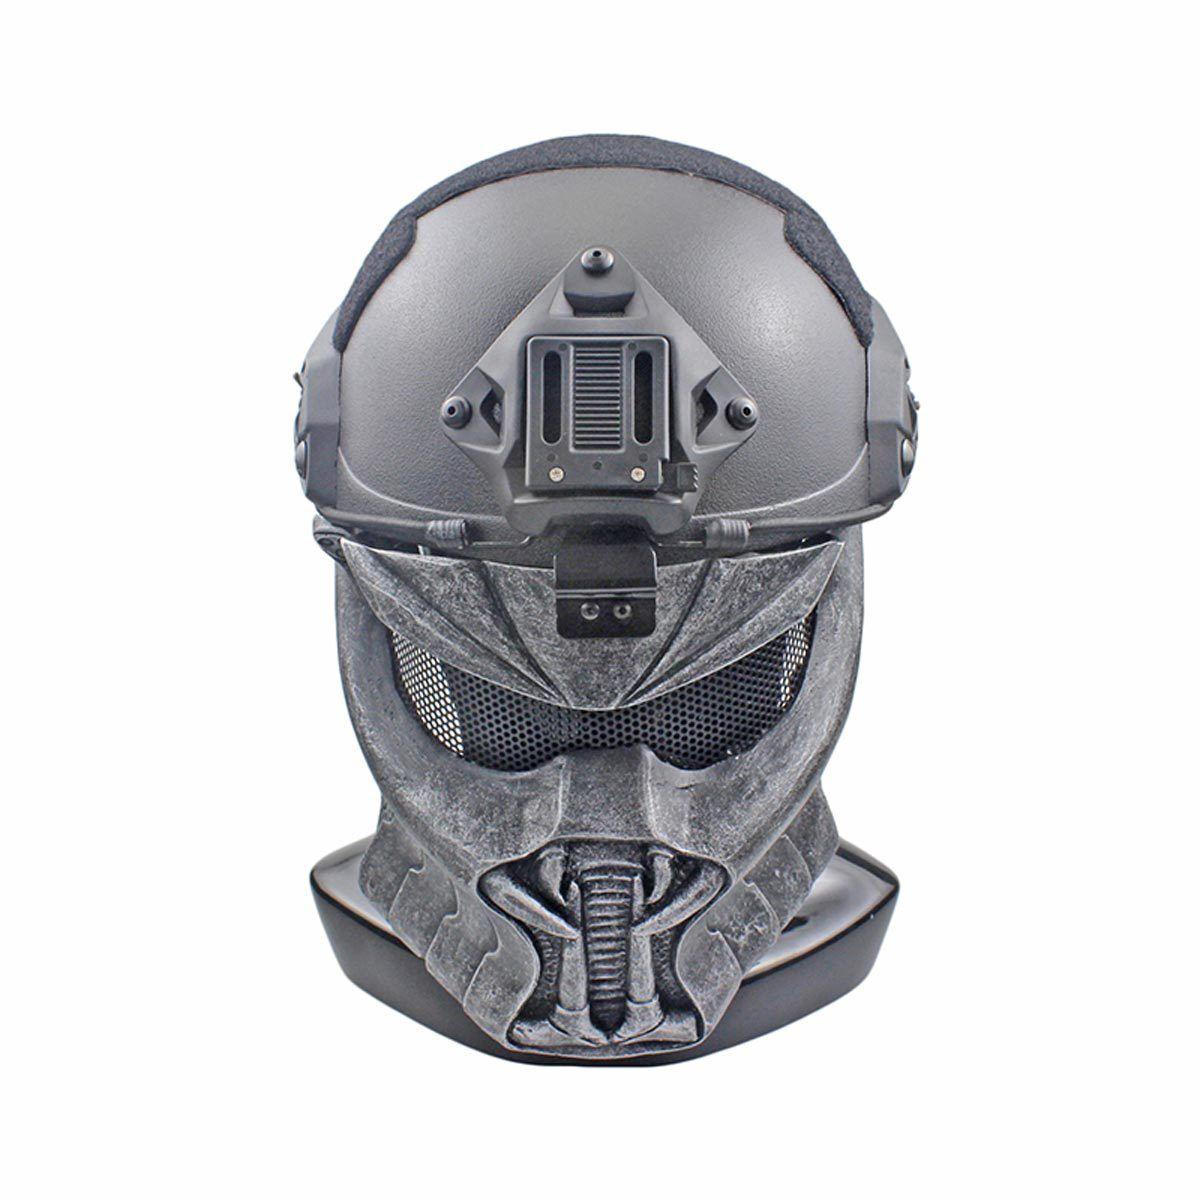 NEW Wire Mesh Glass Fiber Resin Airsoft CS Half Face Mask For Helmet M161